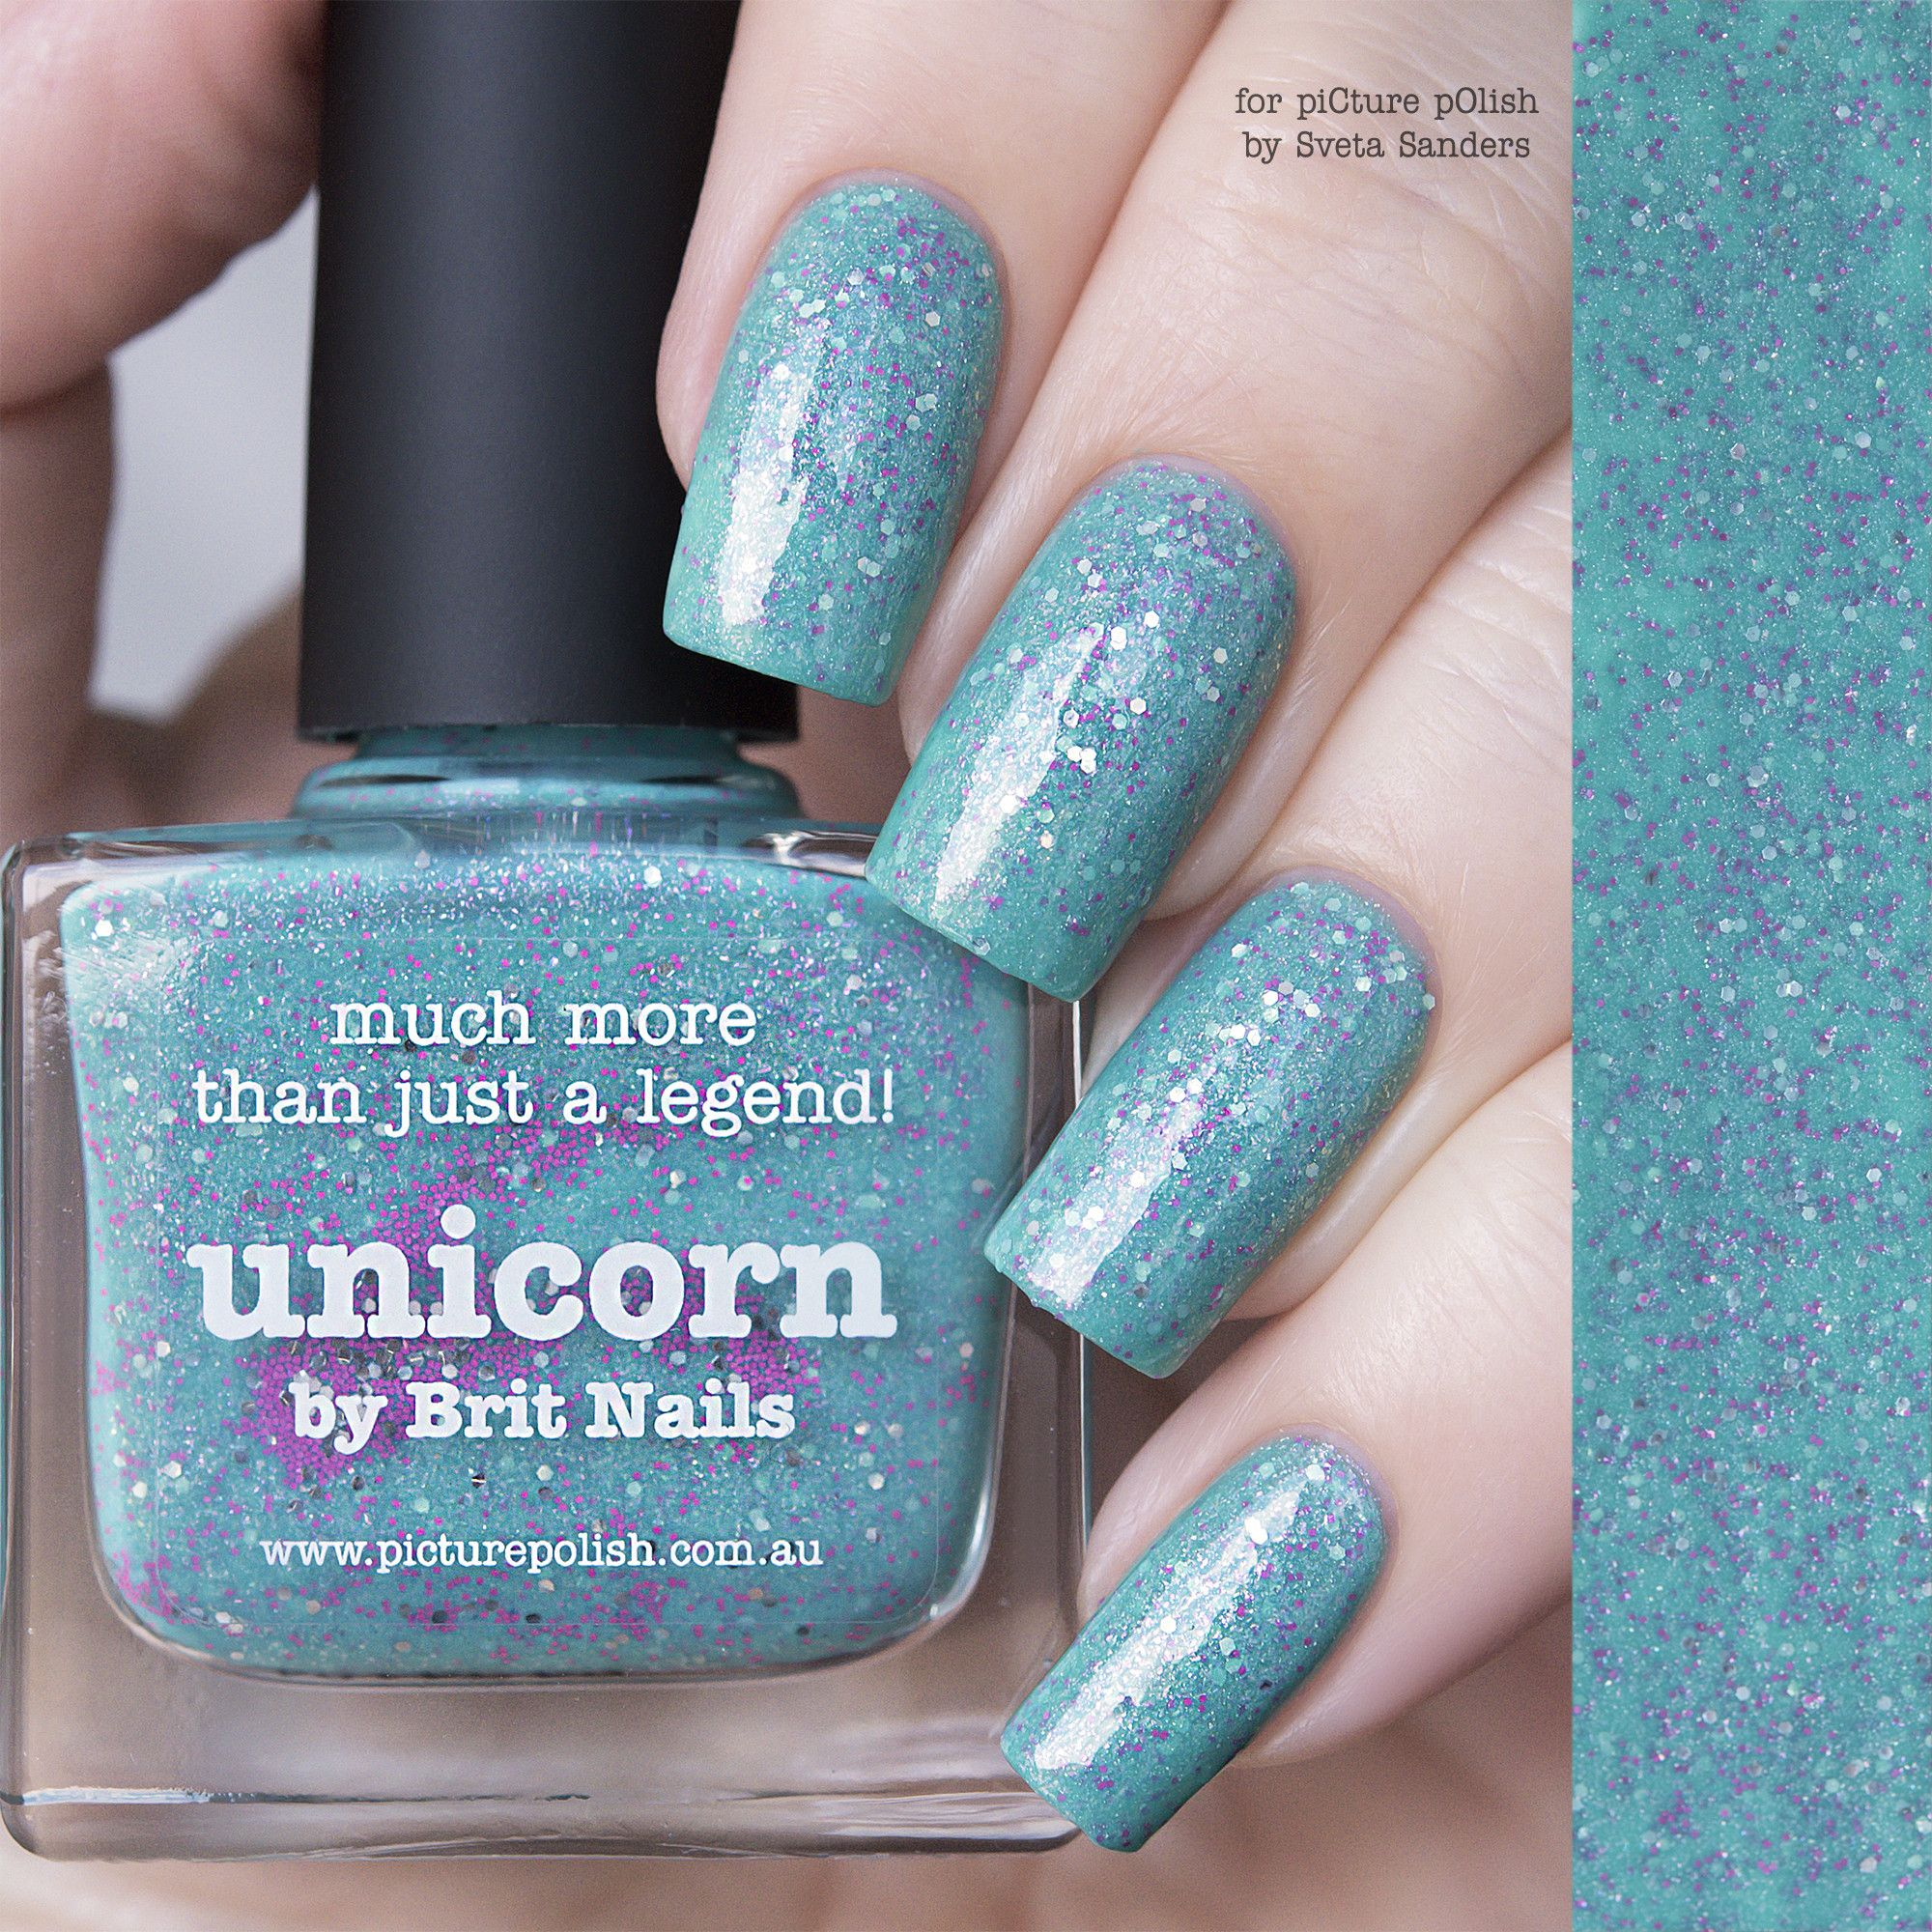 Picture Polish Unicorn Nail Polish | Nails | Pinterest | Unicorn ...